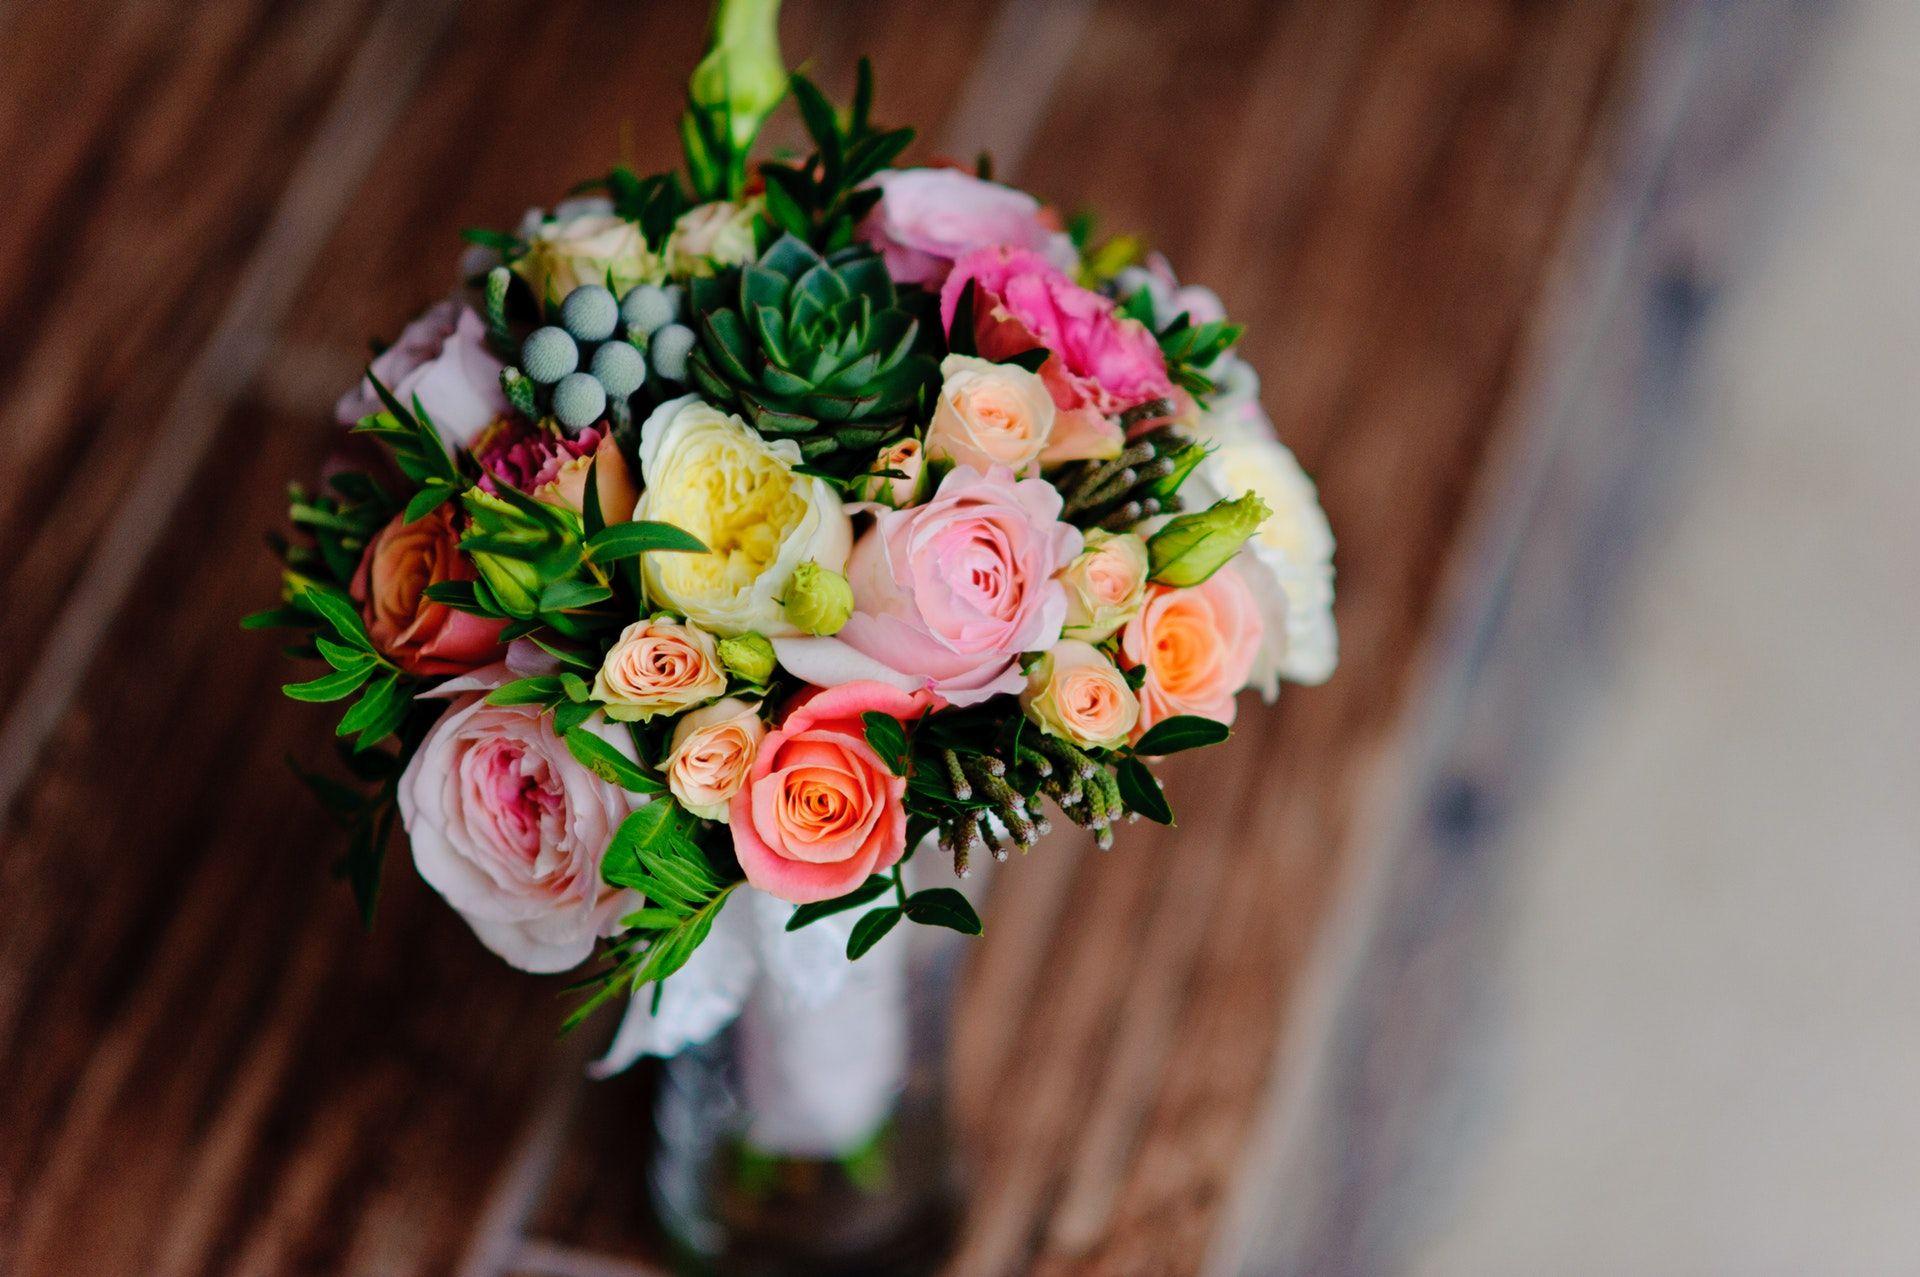 اجمل صور بوكيه ورد لاعياد الميلاد وللأحبه موقع مصري Orange Flower Bouquets Floral Wedding Flowers